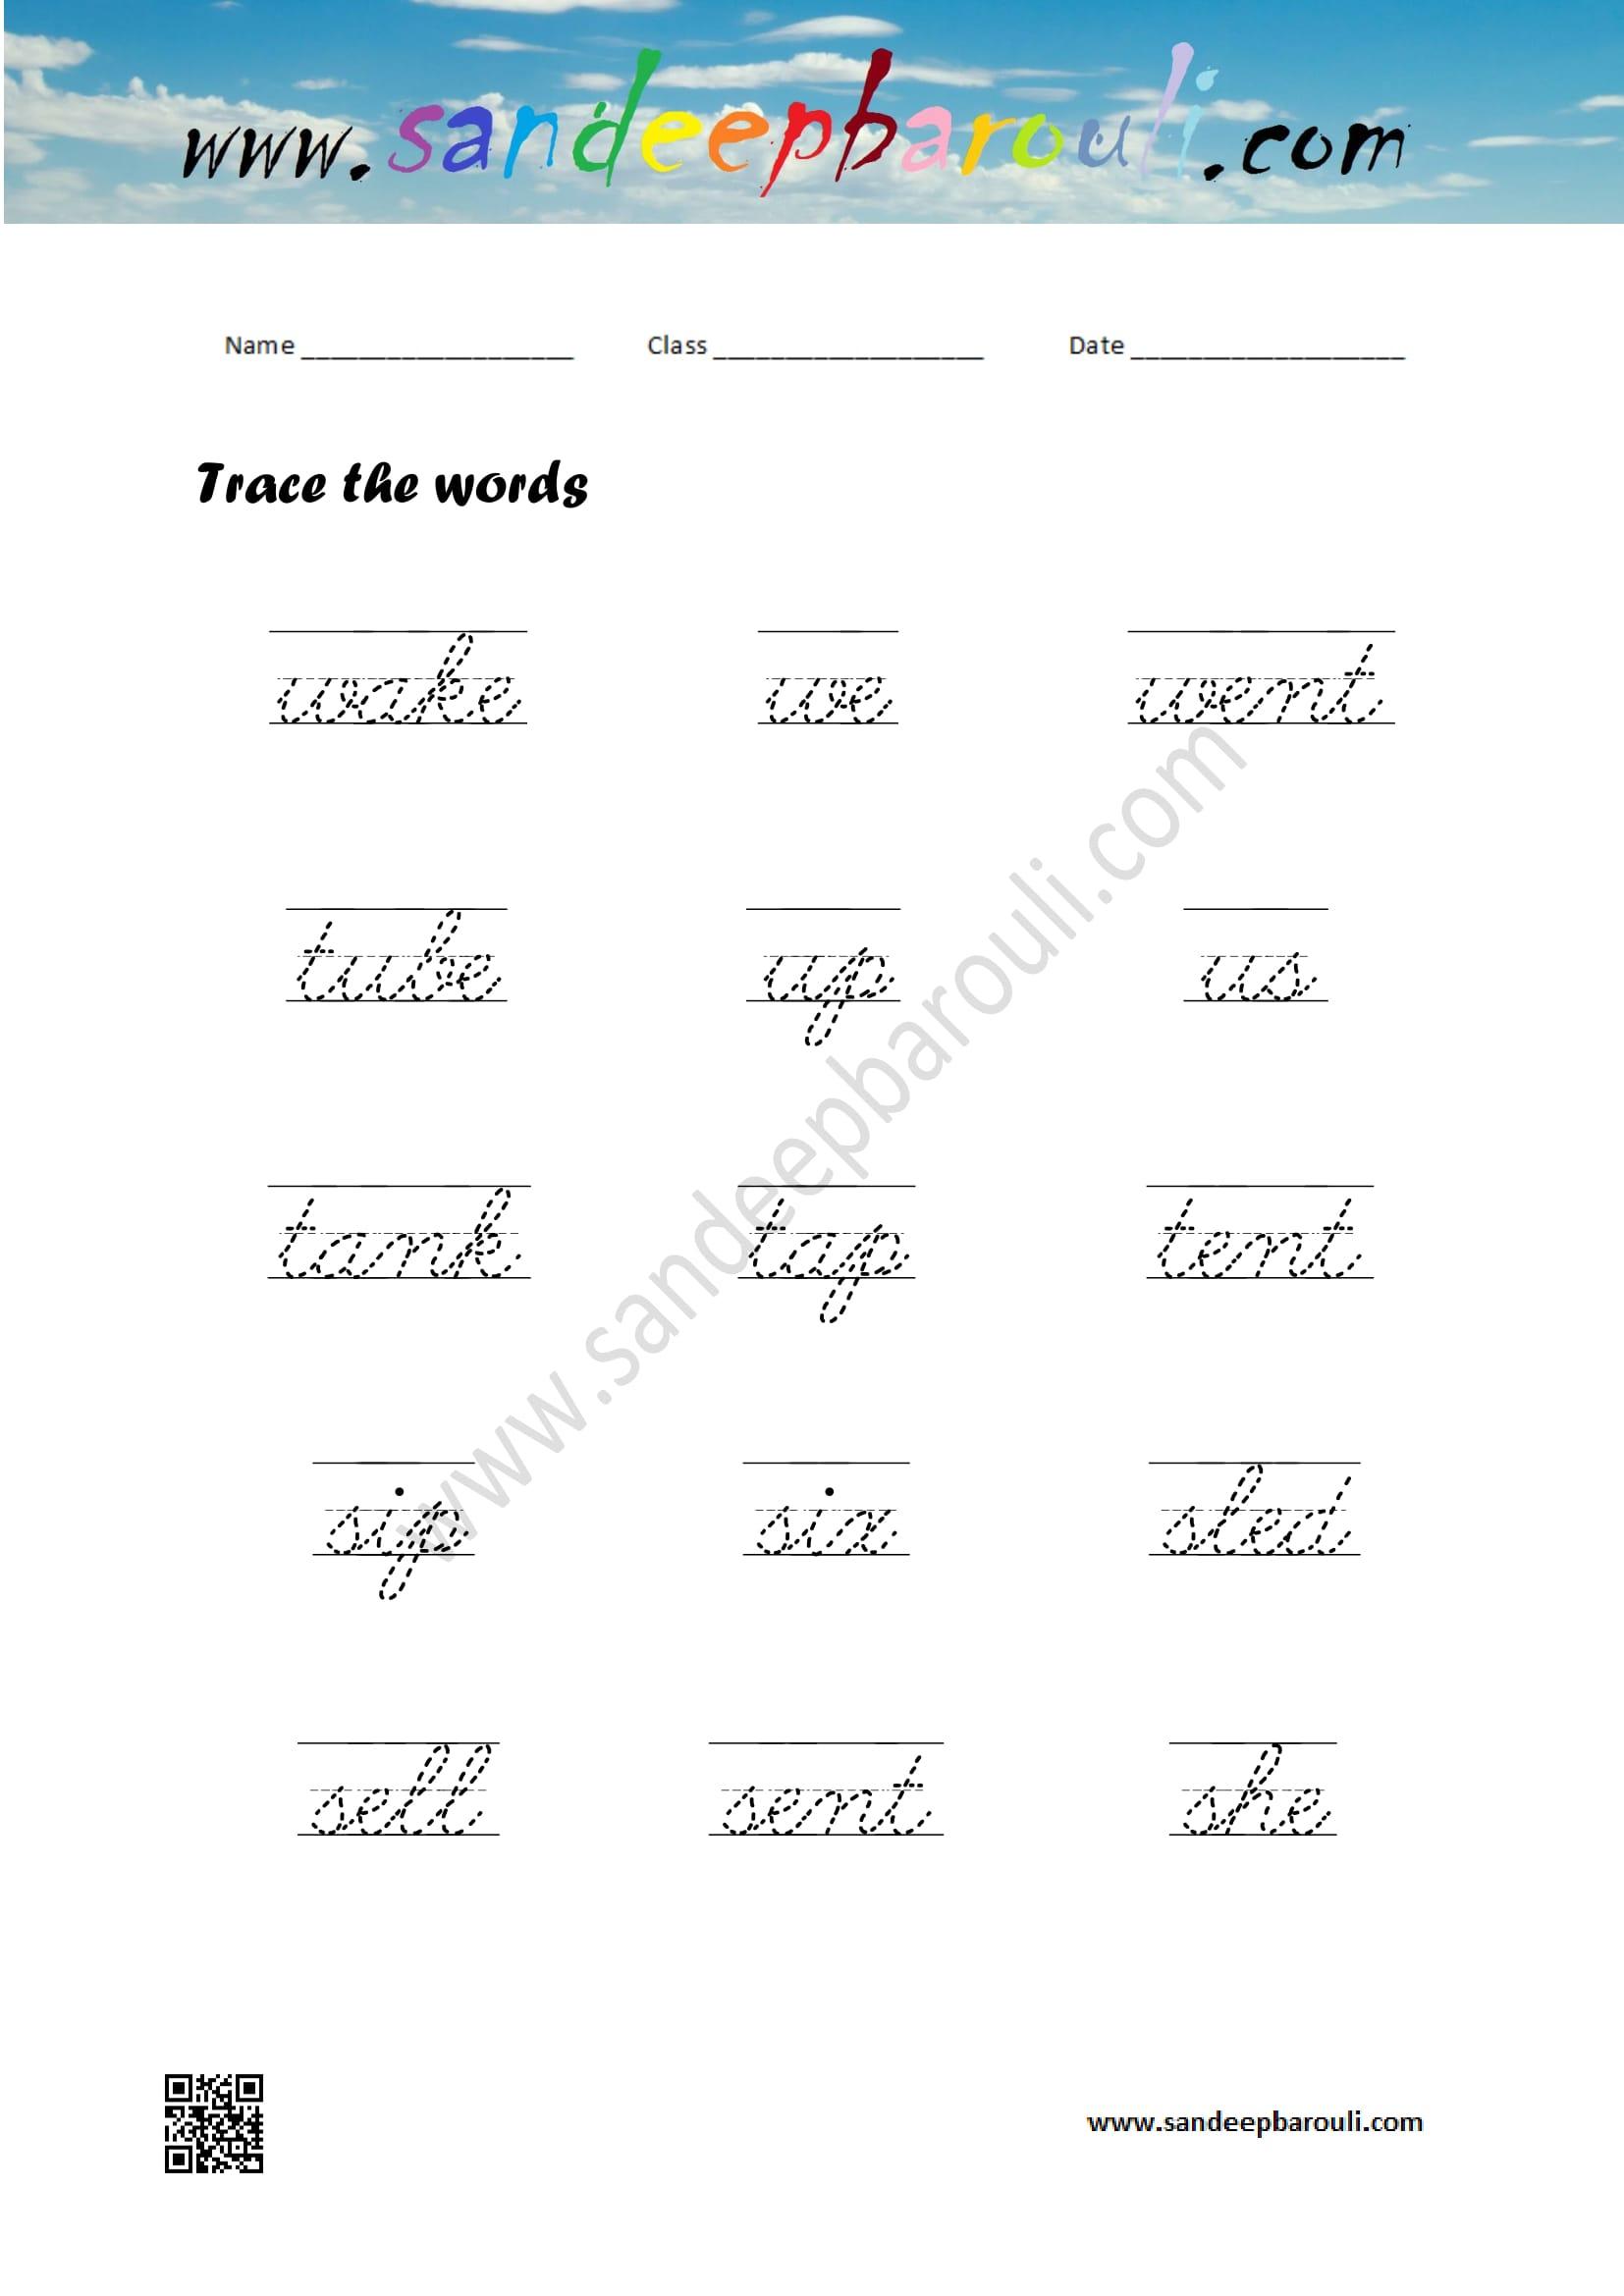 Cursive Writing Worksheet Trace The Words 3 Sandeepbarouli